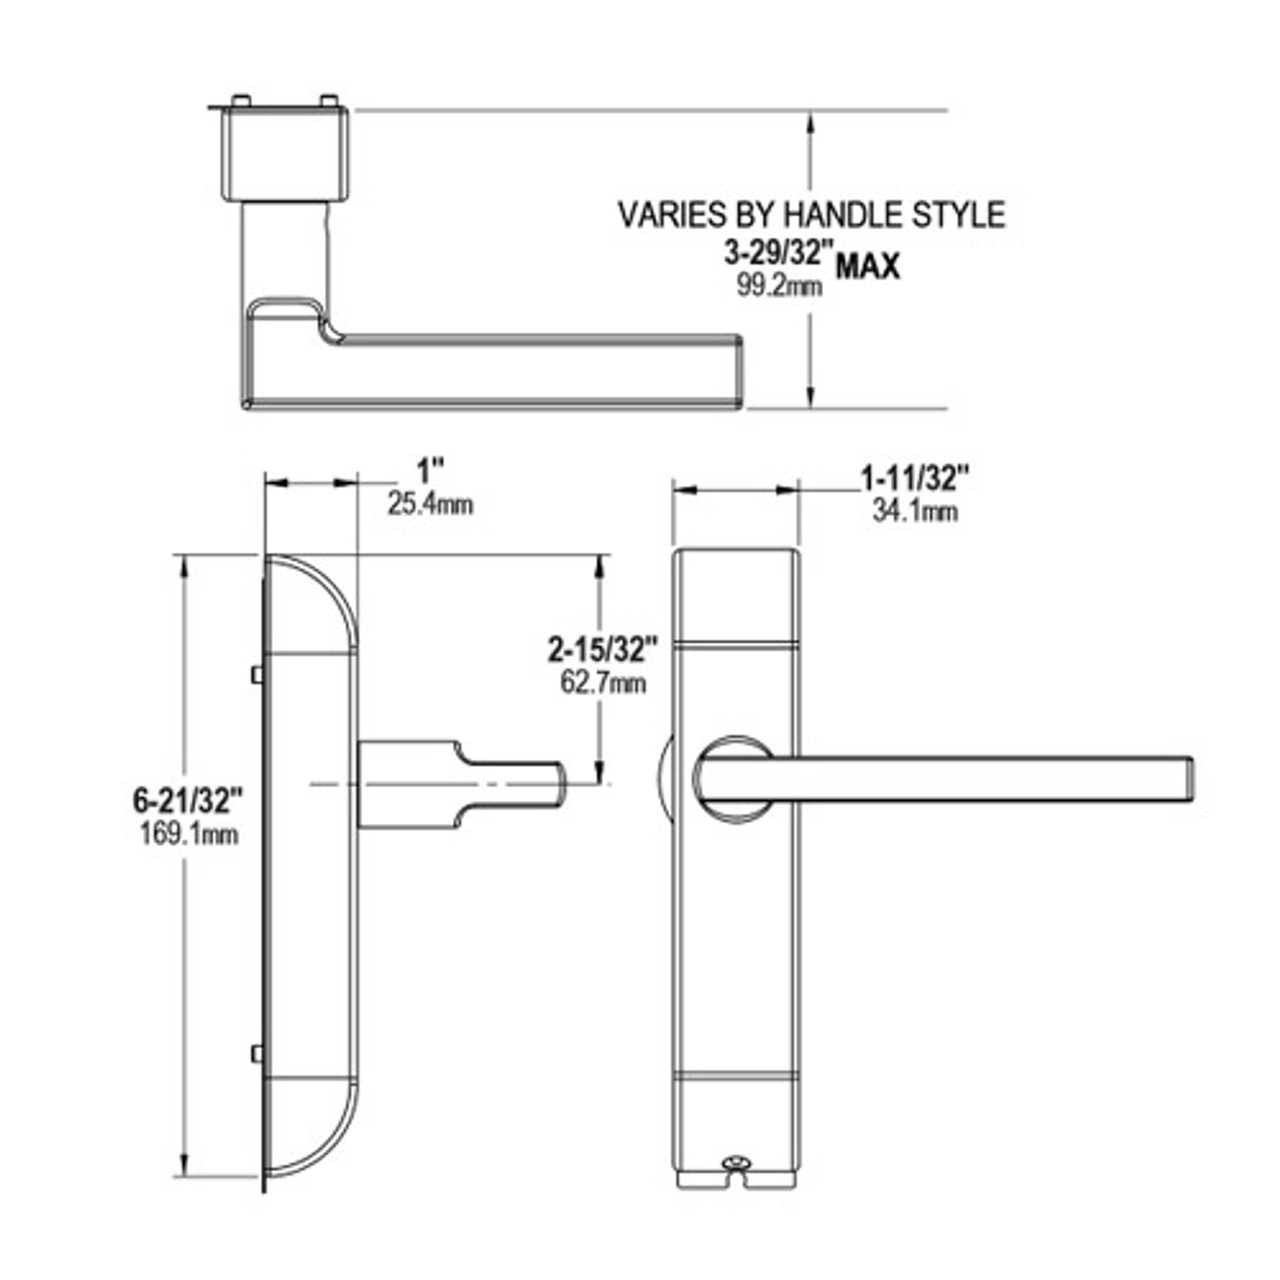 4600M-MI-652-US4 Adams Rite MI Designer handle Dimensional View